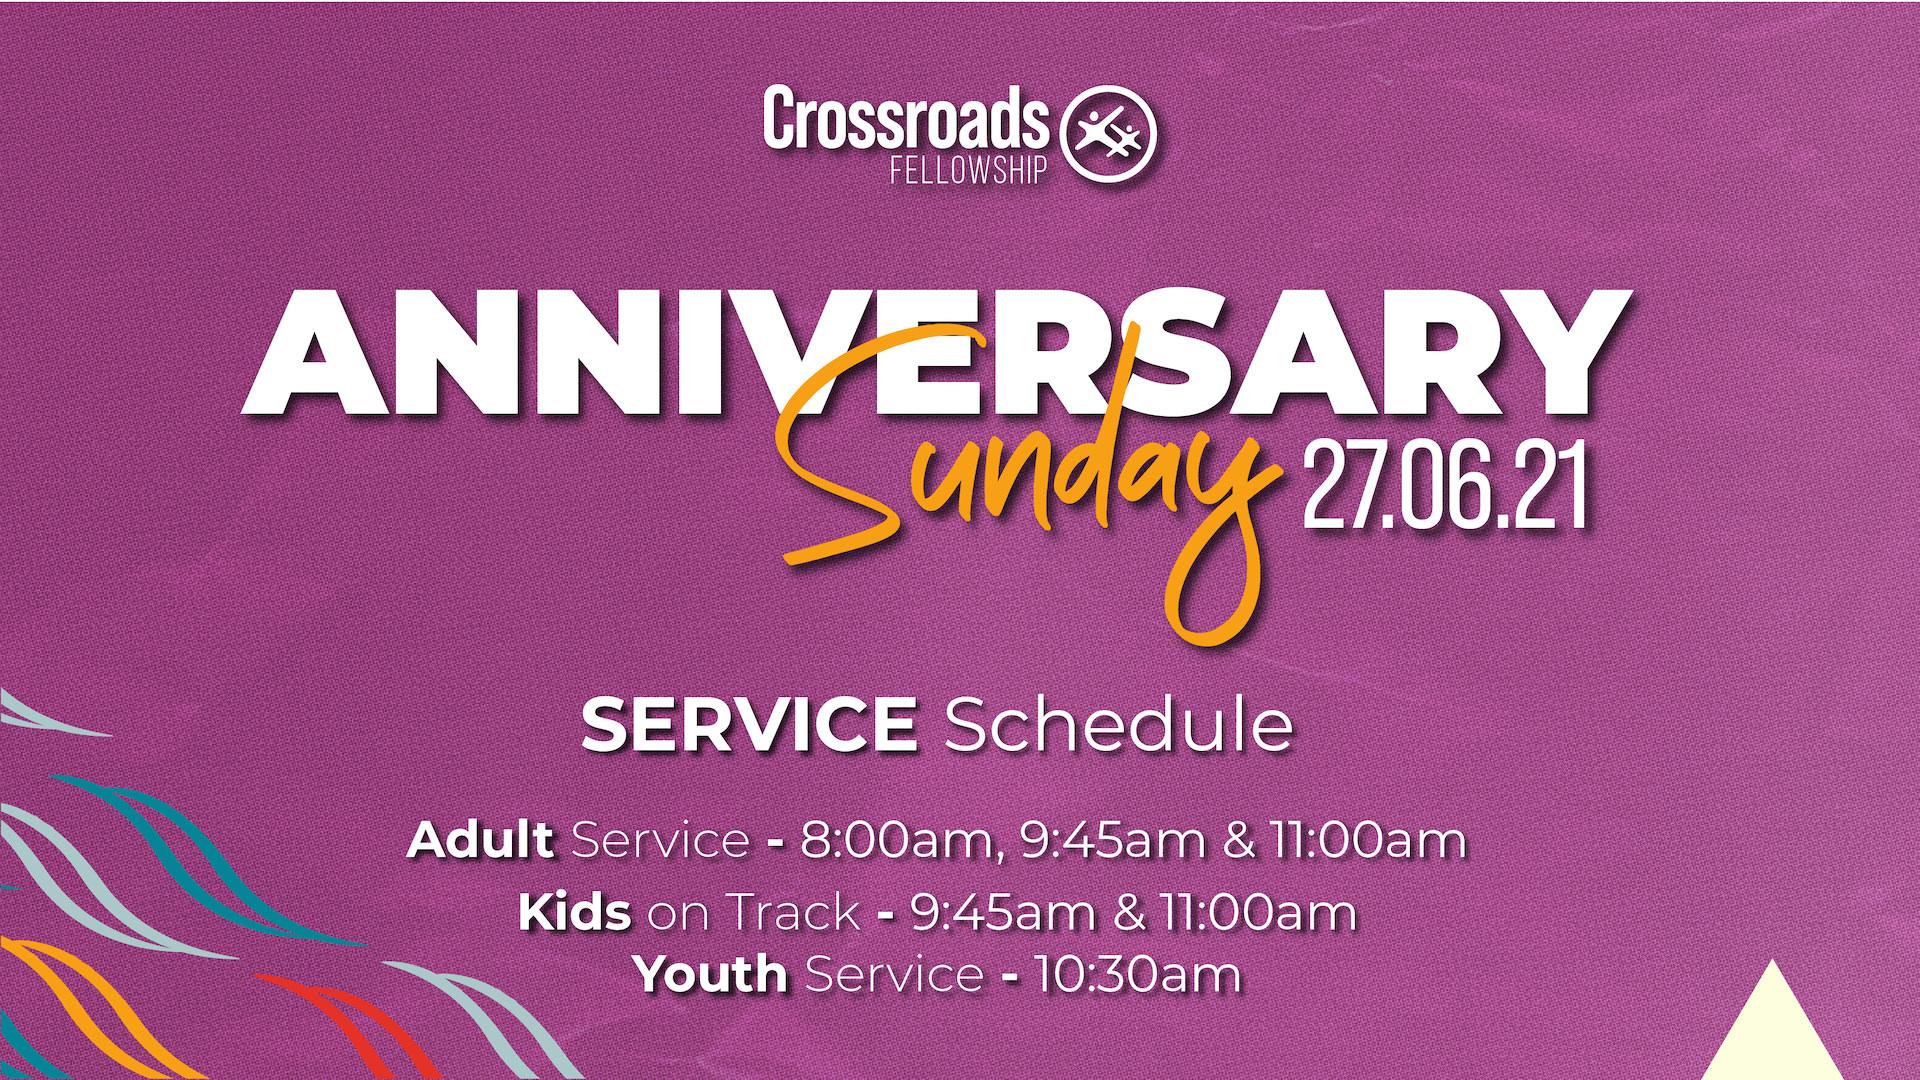 19th anniversary celebration of Crossroads Fellowship Nyali Christian church in Mombasa Kenya